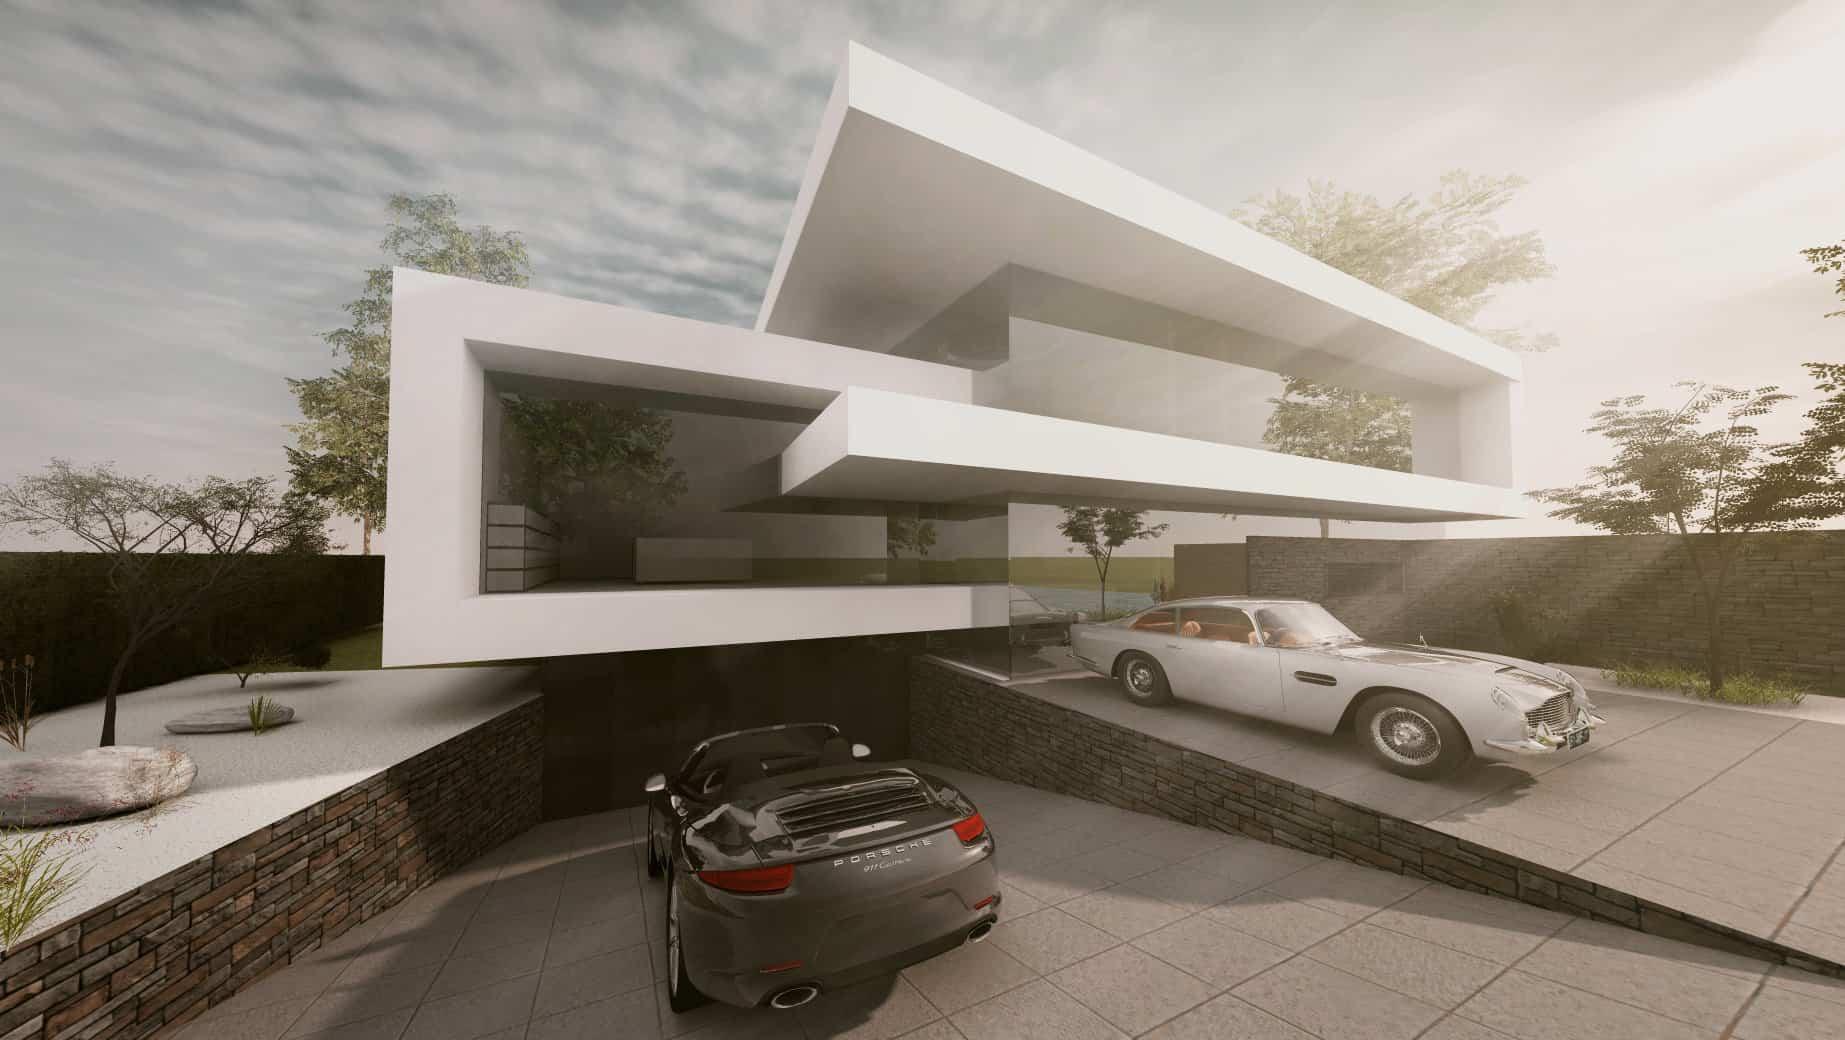 Perfekt Moderne Häuser U0026 Gebäude